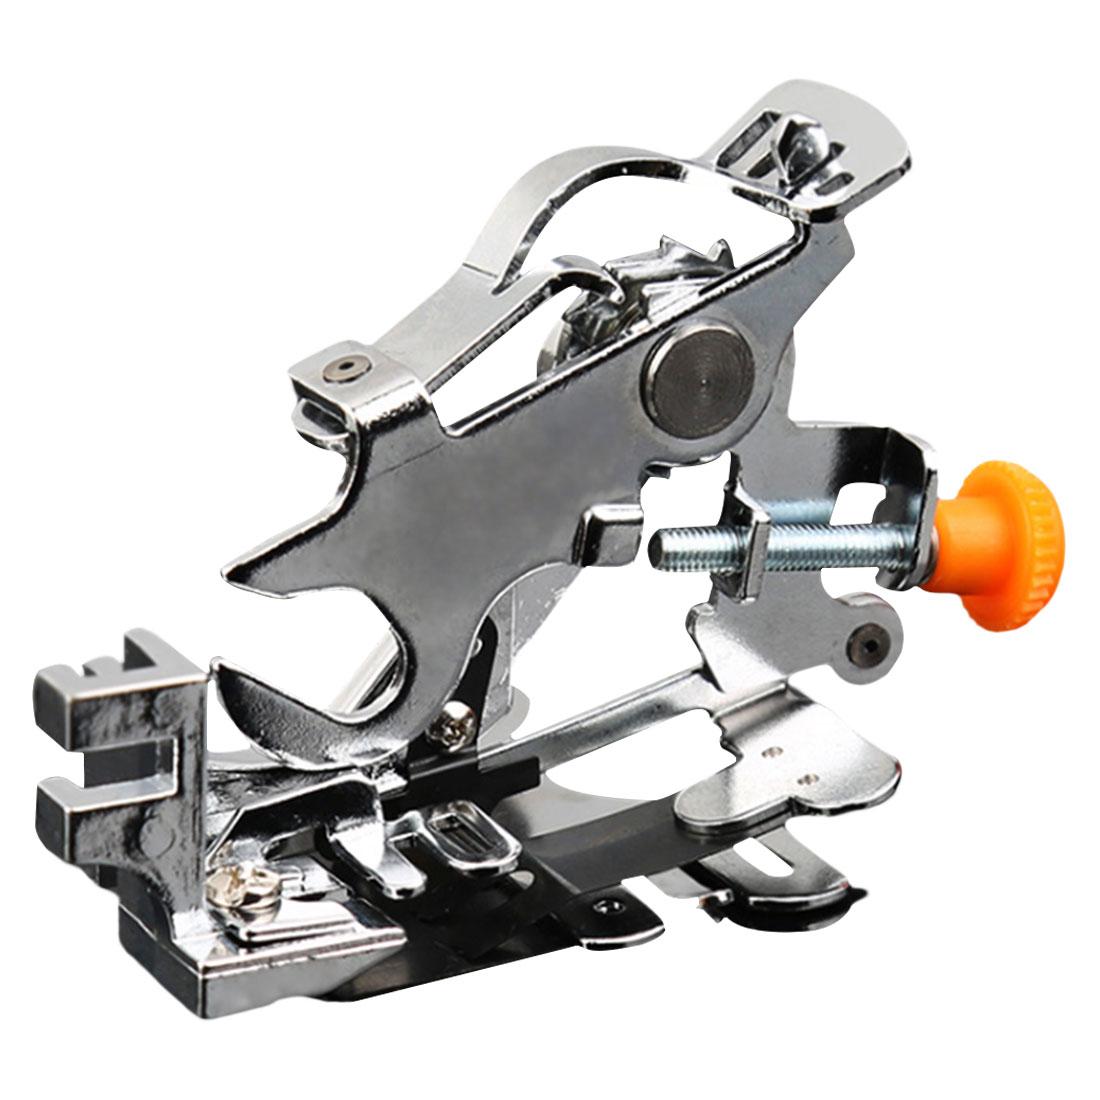 Household Ruffler Presser Foot Low Shank Pleated Attachment Presser Foot Sewing Machine Accessories